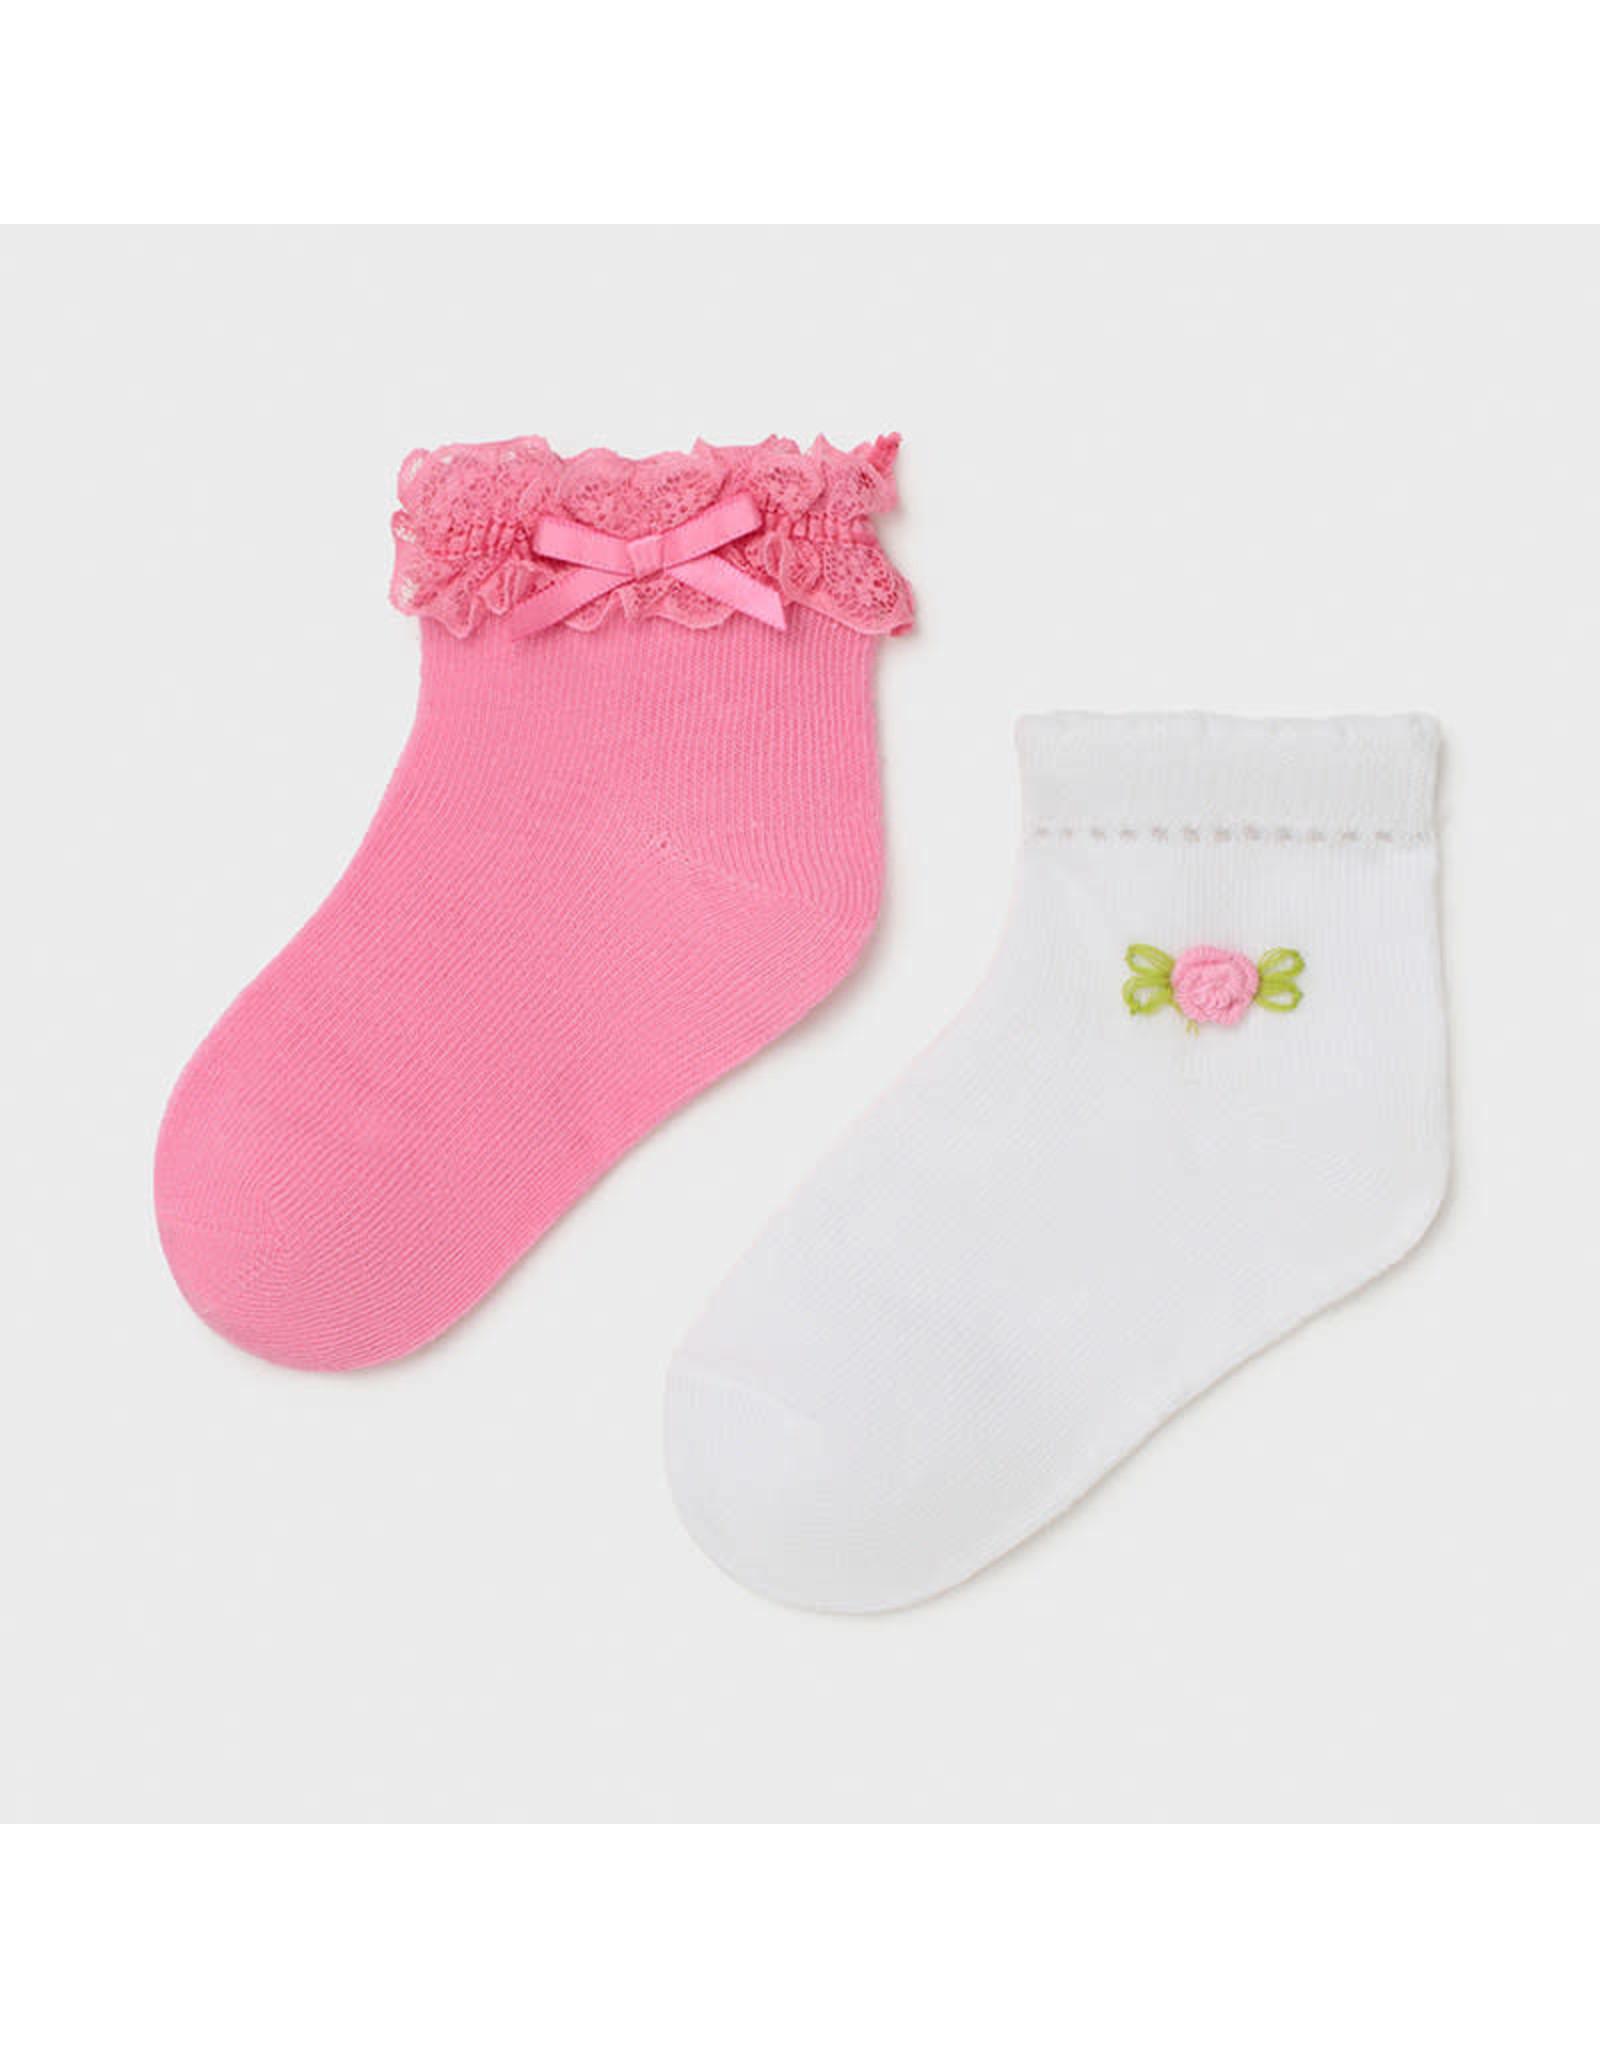 Mayoral 2 Socks Set - Cameillia